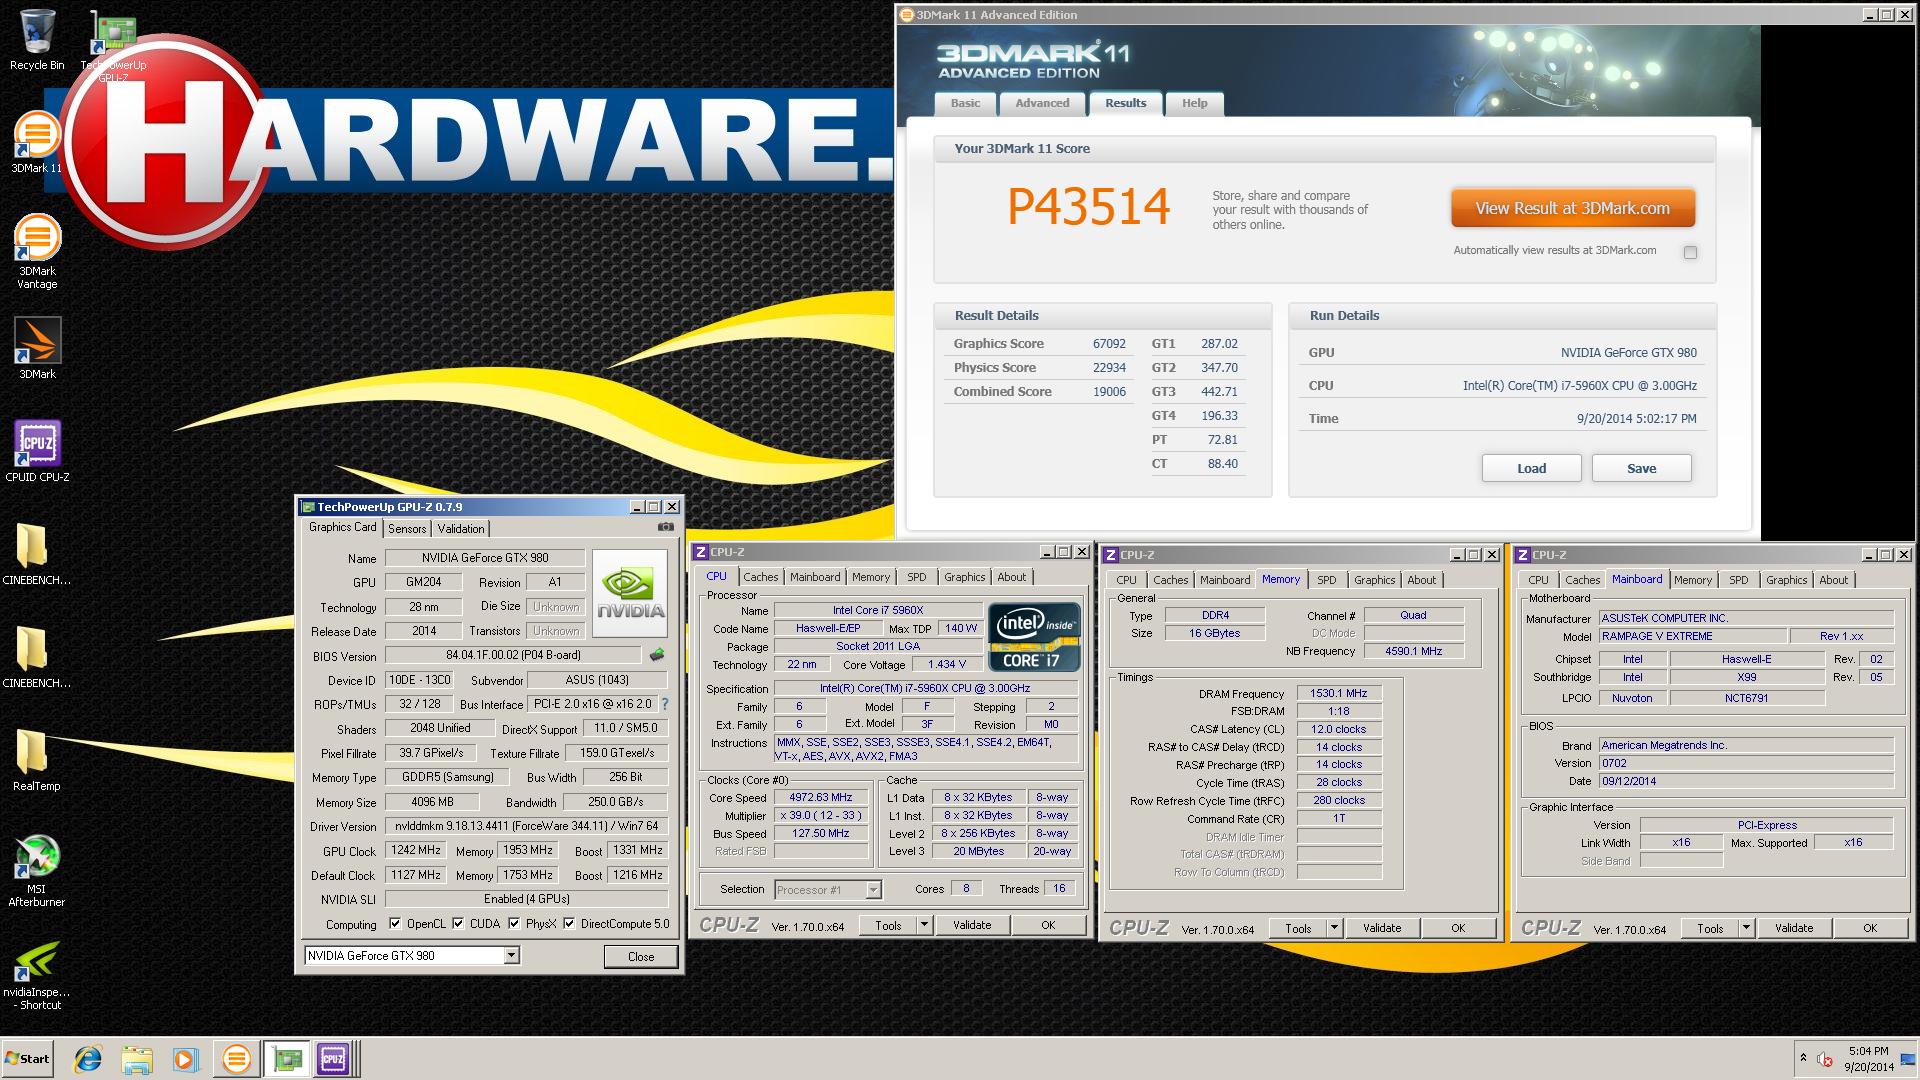 Nvidia GeForce GTX 980 world record 4-way SLI ASUS Tones screenshot